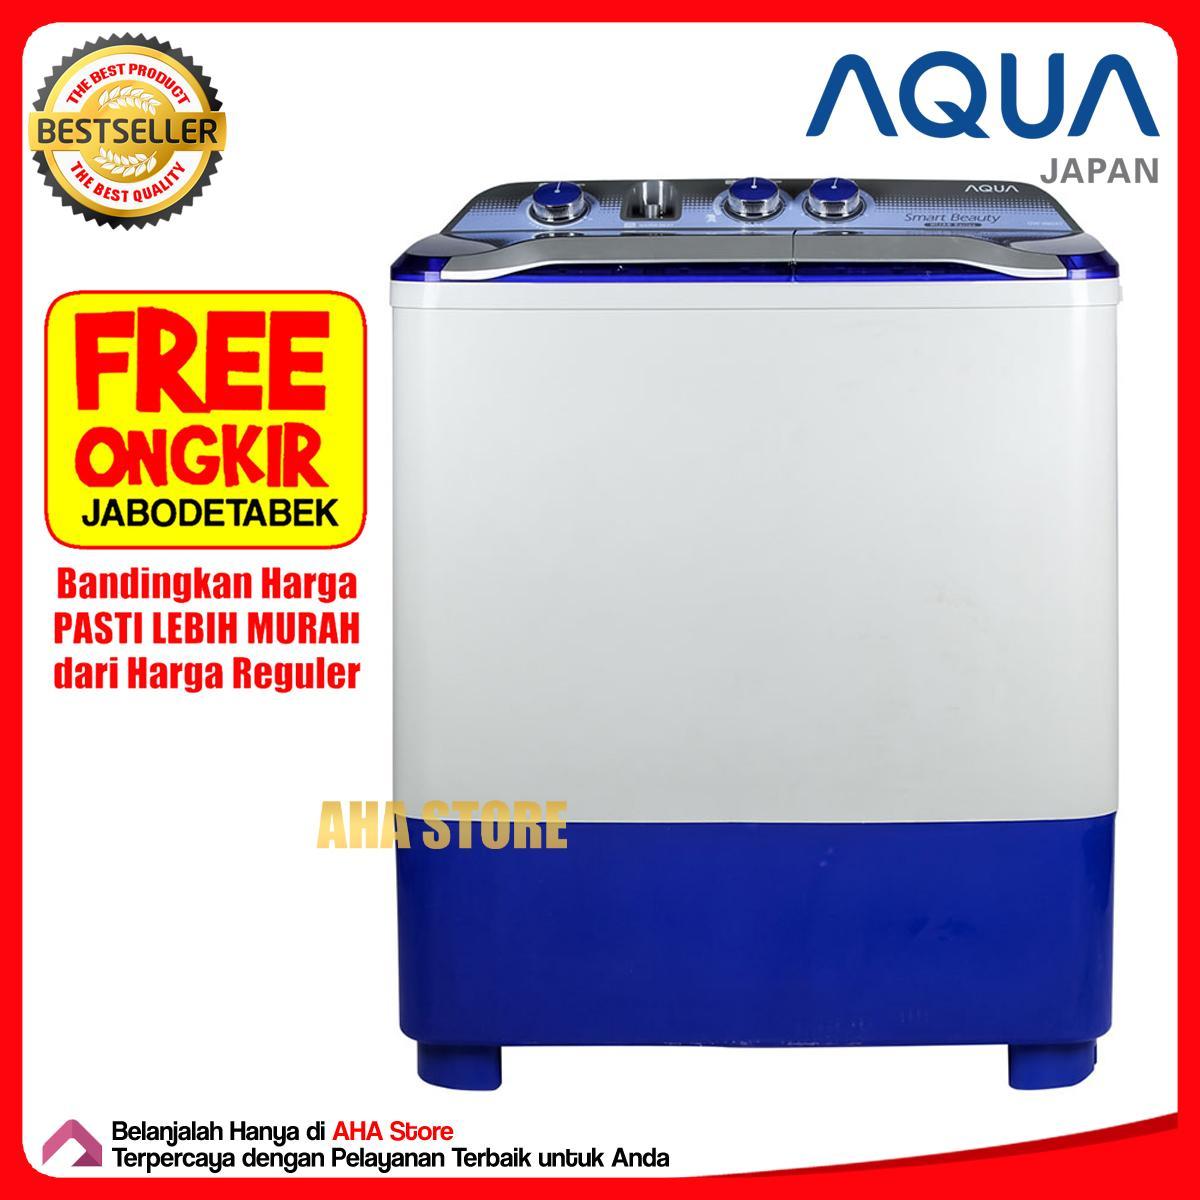 Kelebihan Aqua Aqw89xtf Mesin Cuci Top Loading 1 Tabung Gratis 2 9kg Qw980xt Putih Free Ongkir Jabodetabek 8 Kg Qw 880xt